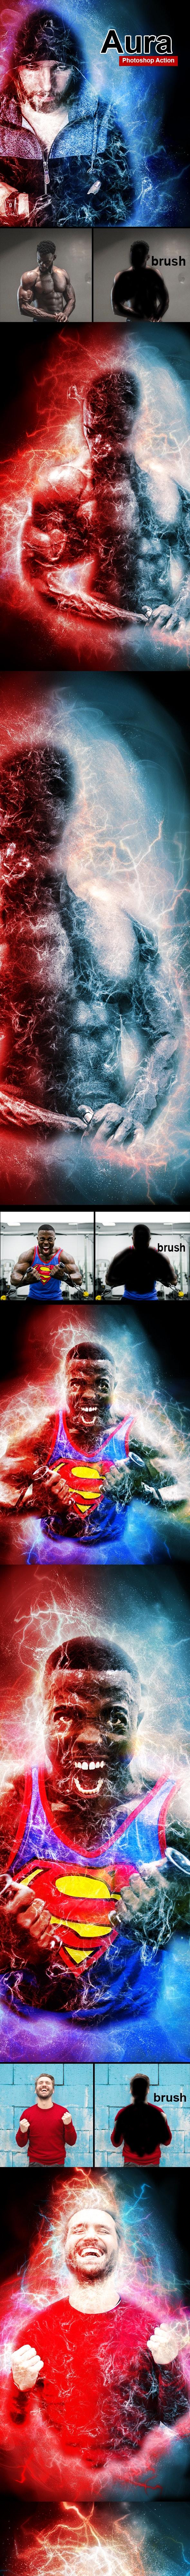 Amazing Aura Photoshop Action Vol 1 - Photo Effects Actions